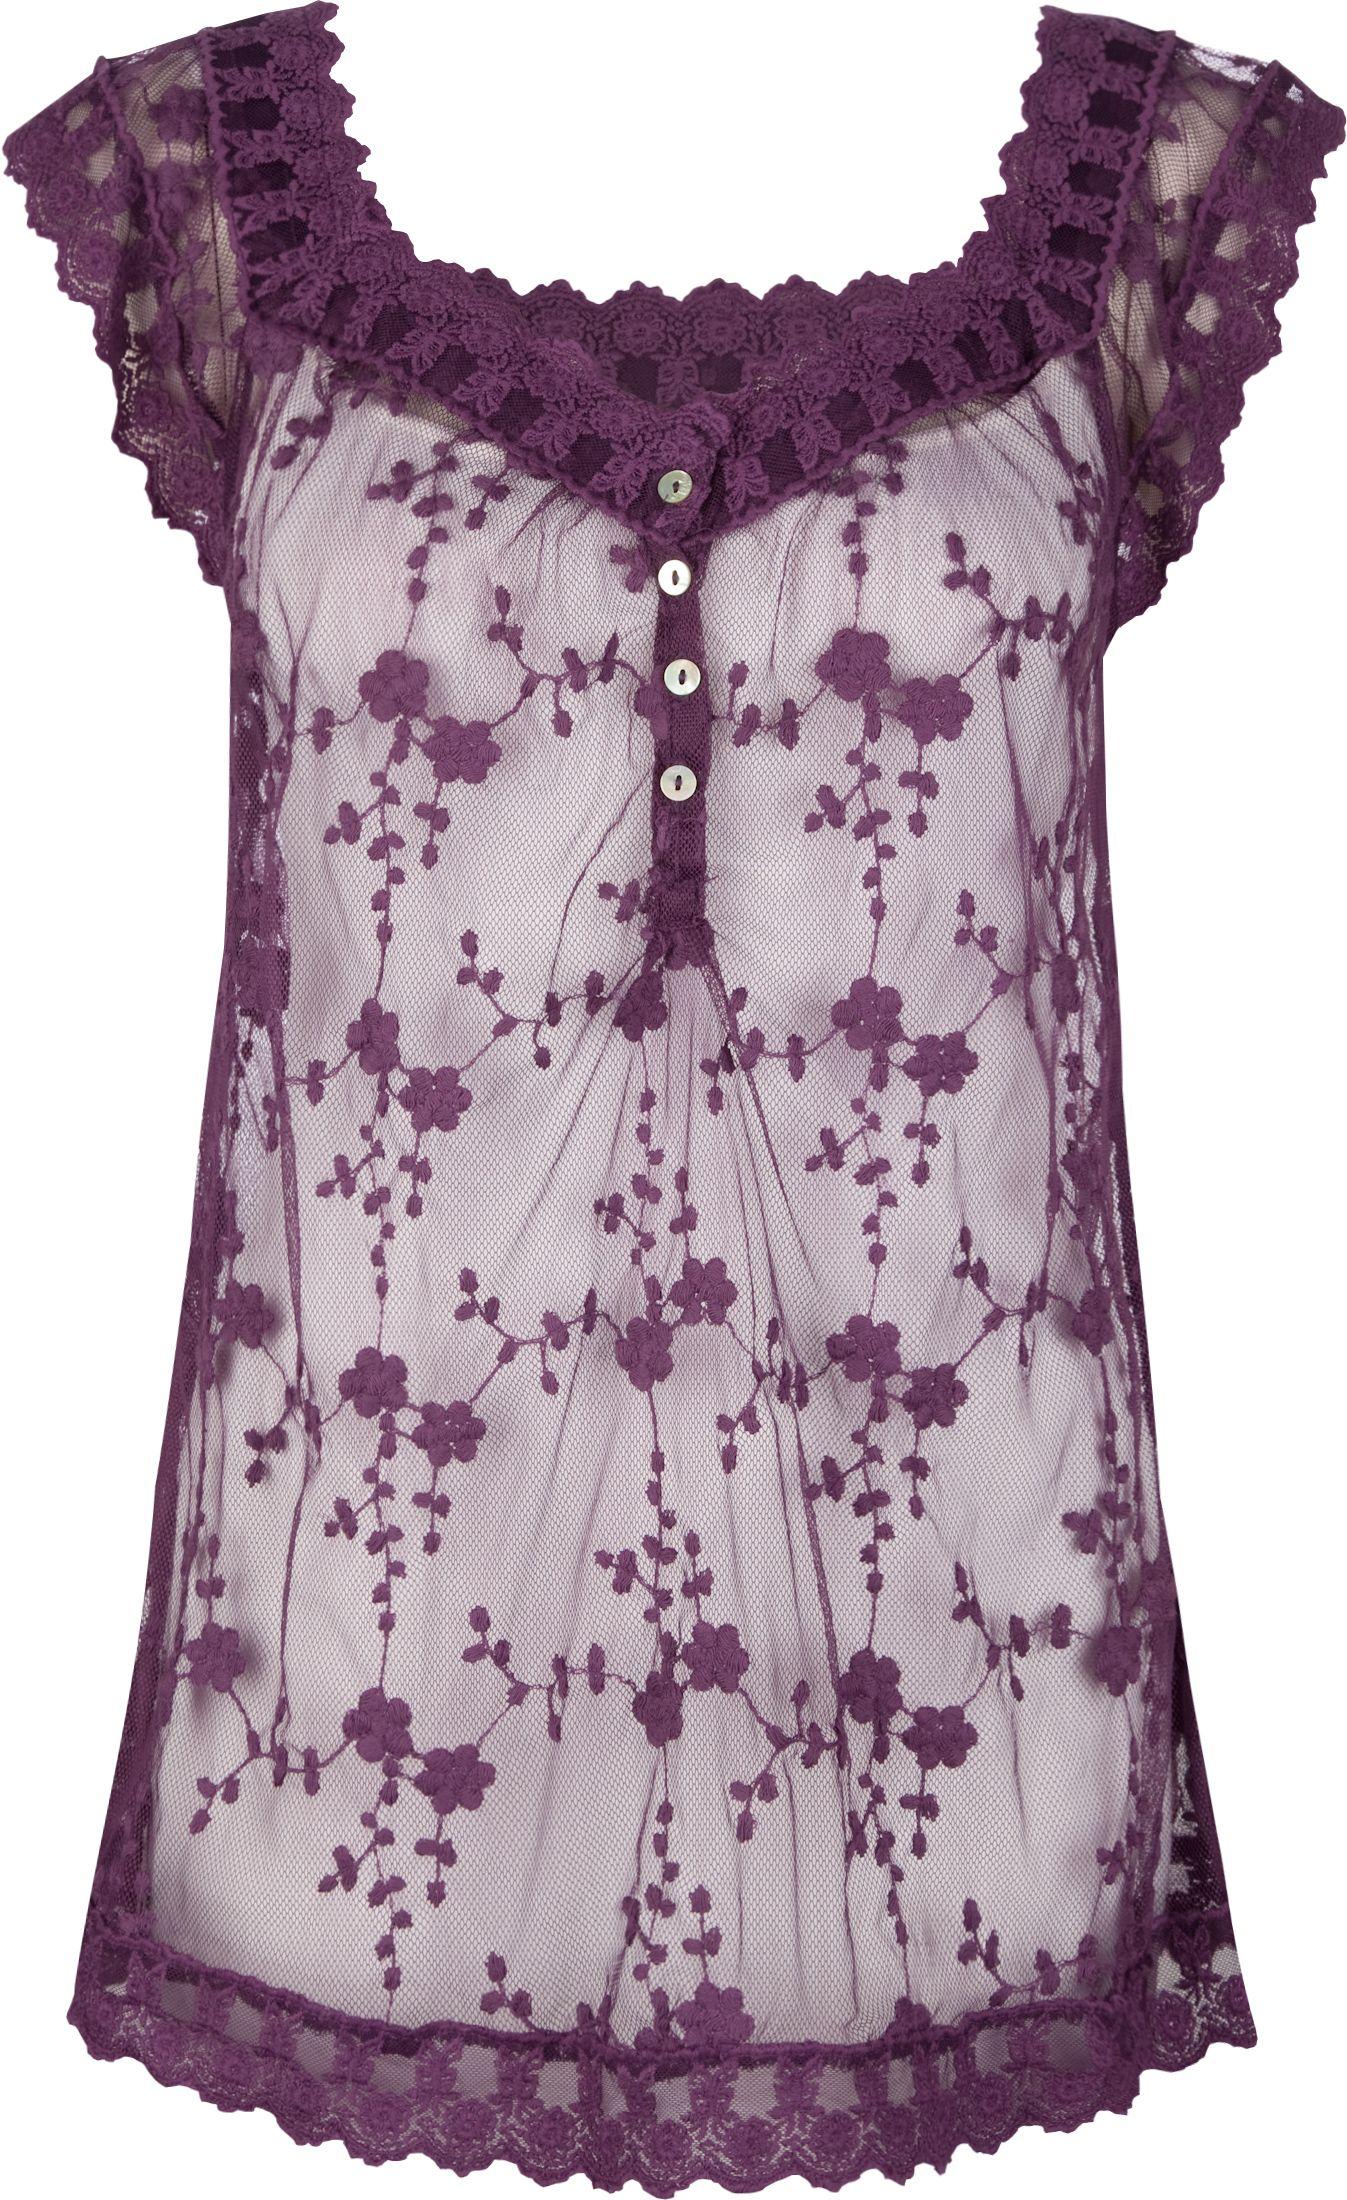 BB DAKOTA Chelsey Womens Top purple model - Google Search